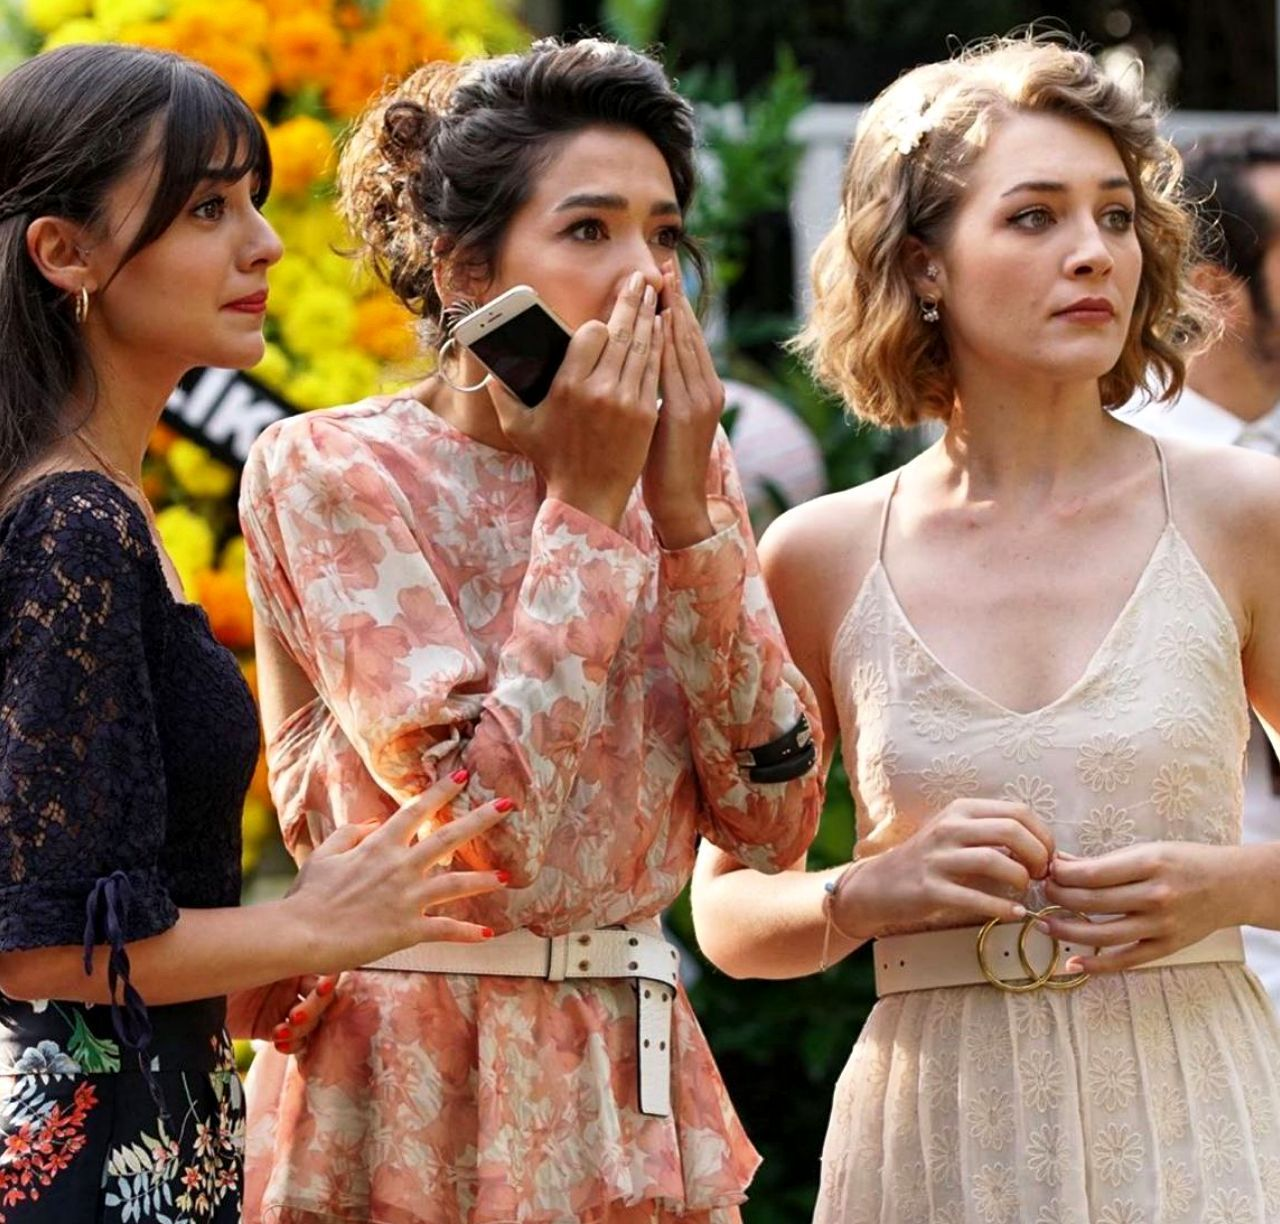 Pin By Steph On Her Yerde Sen Turkish Fashion Turkish Actors Beautiful Series